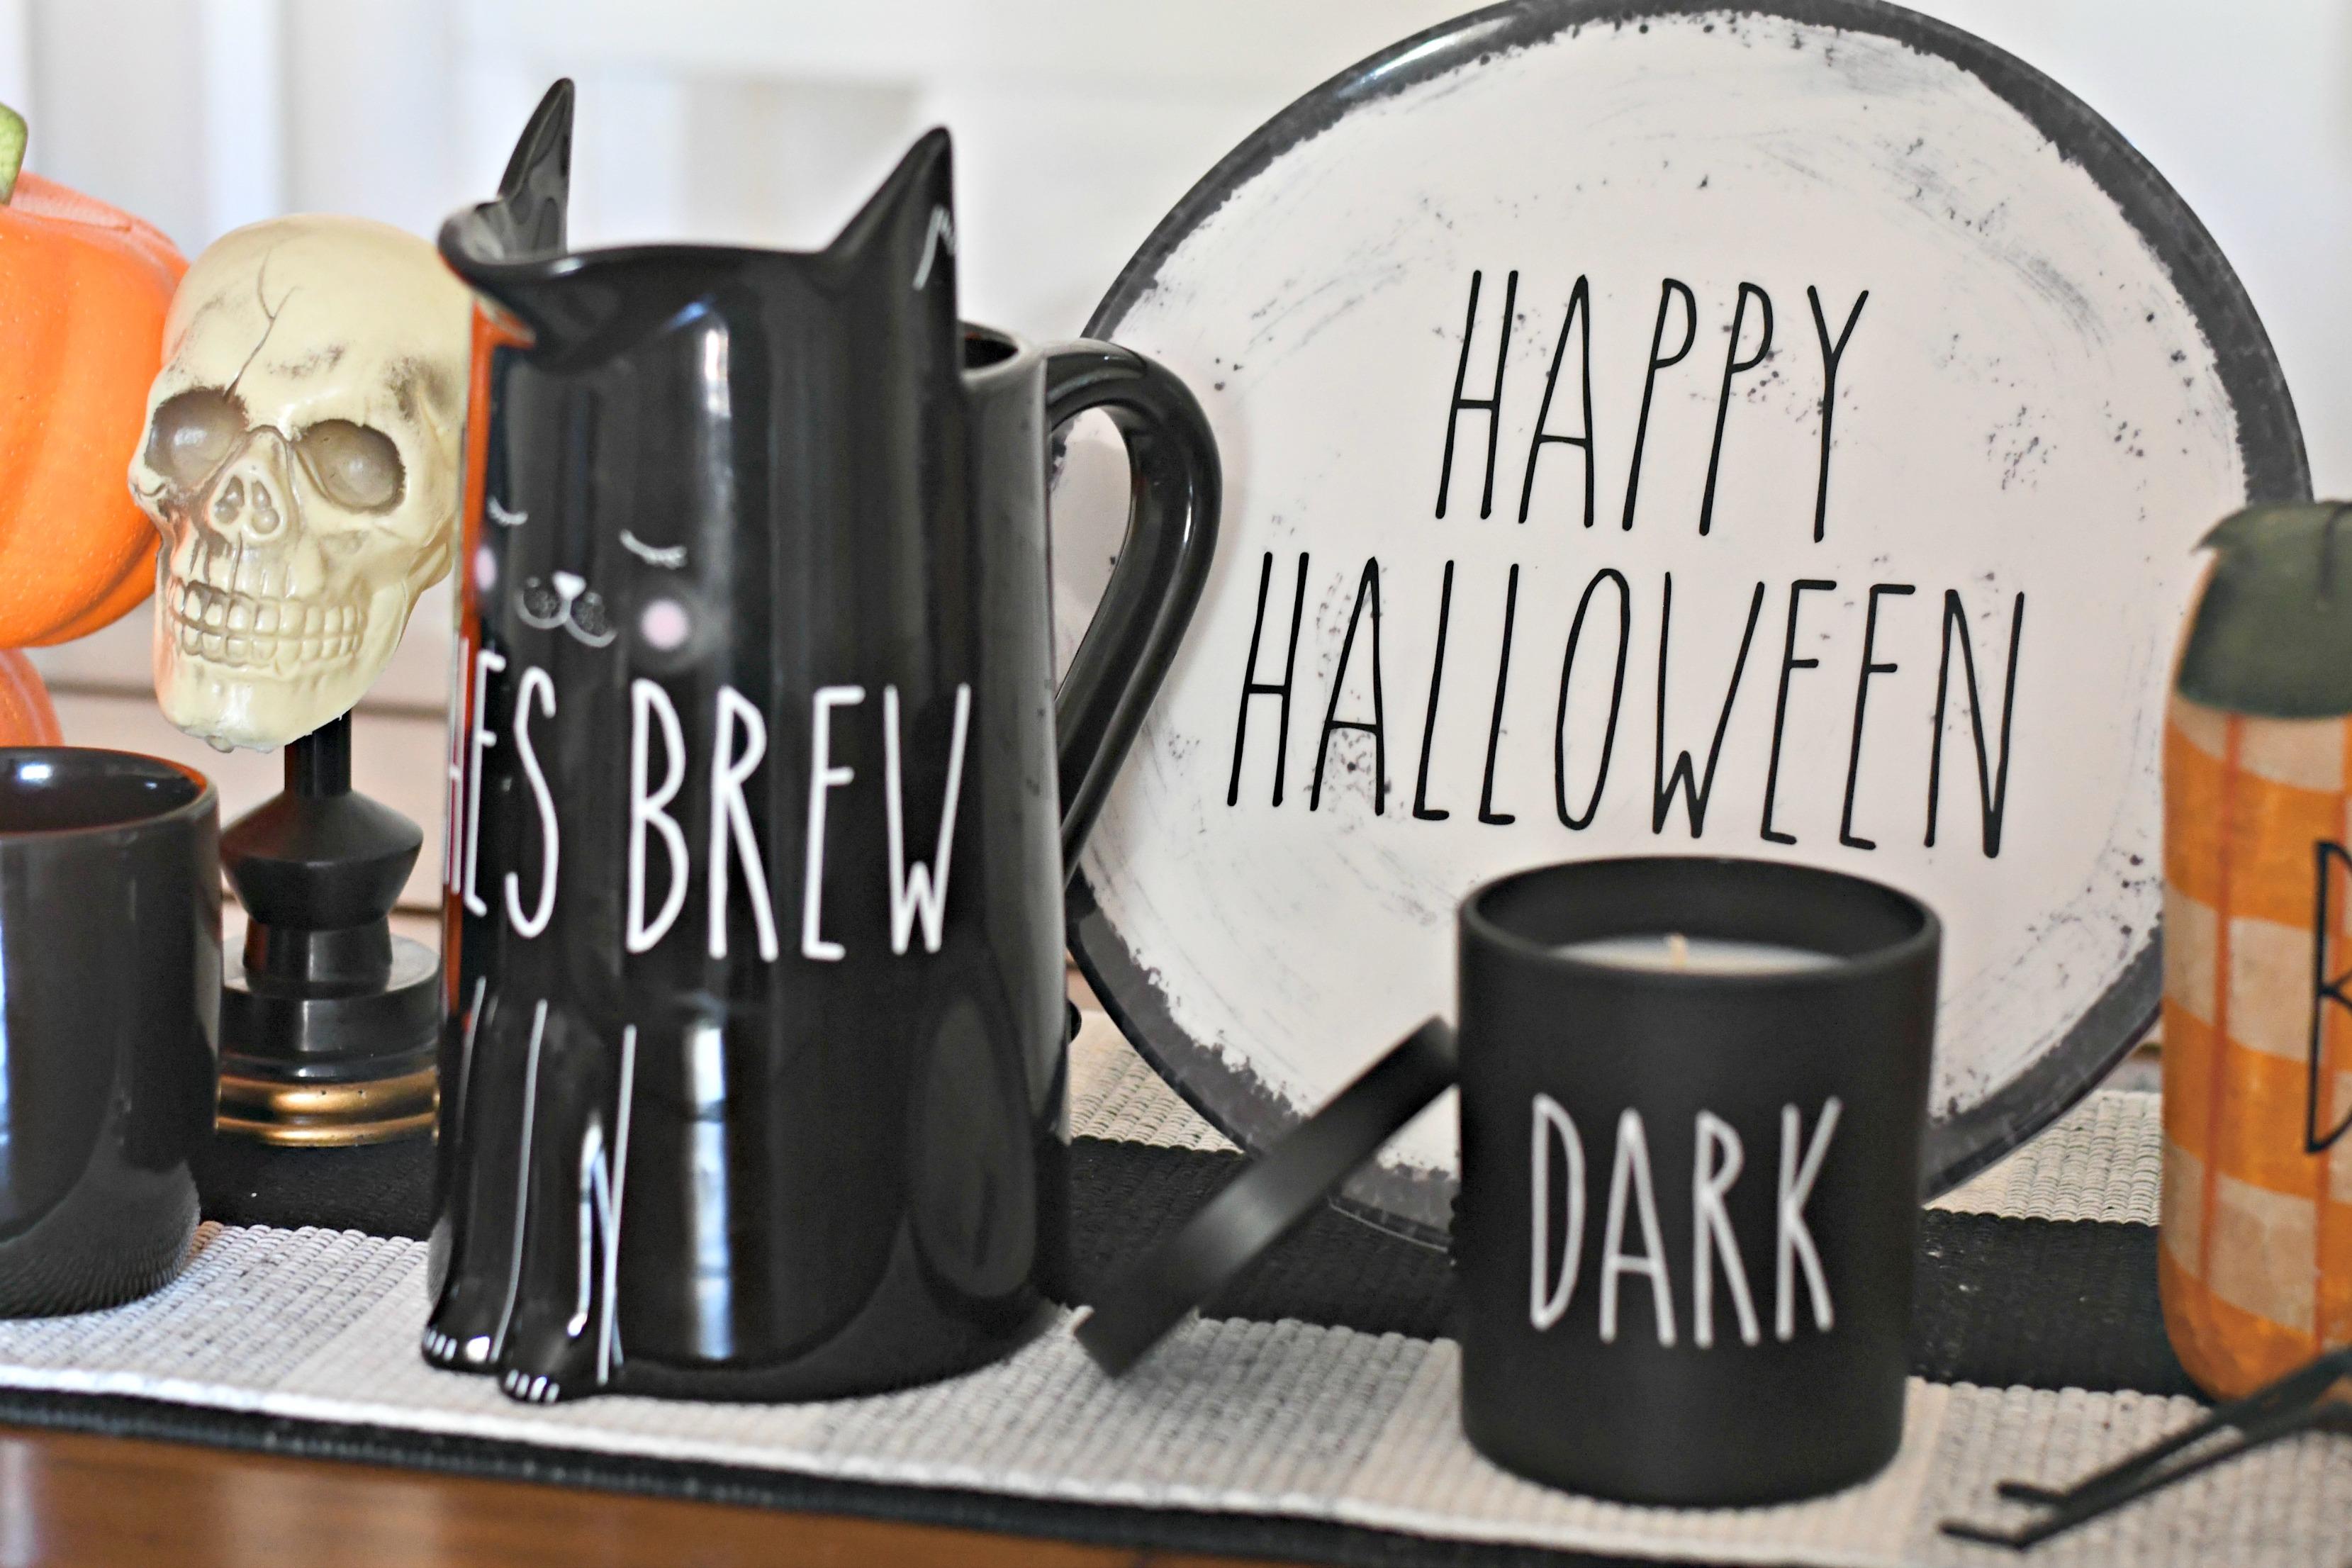 DIY Rae Dunn Inspired Halloween Decor - TJMaxx finds with lettering